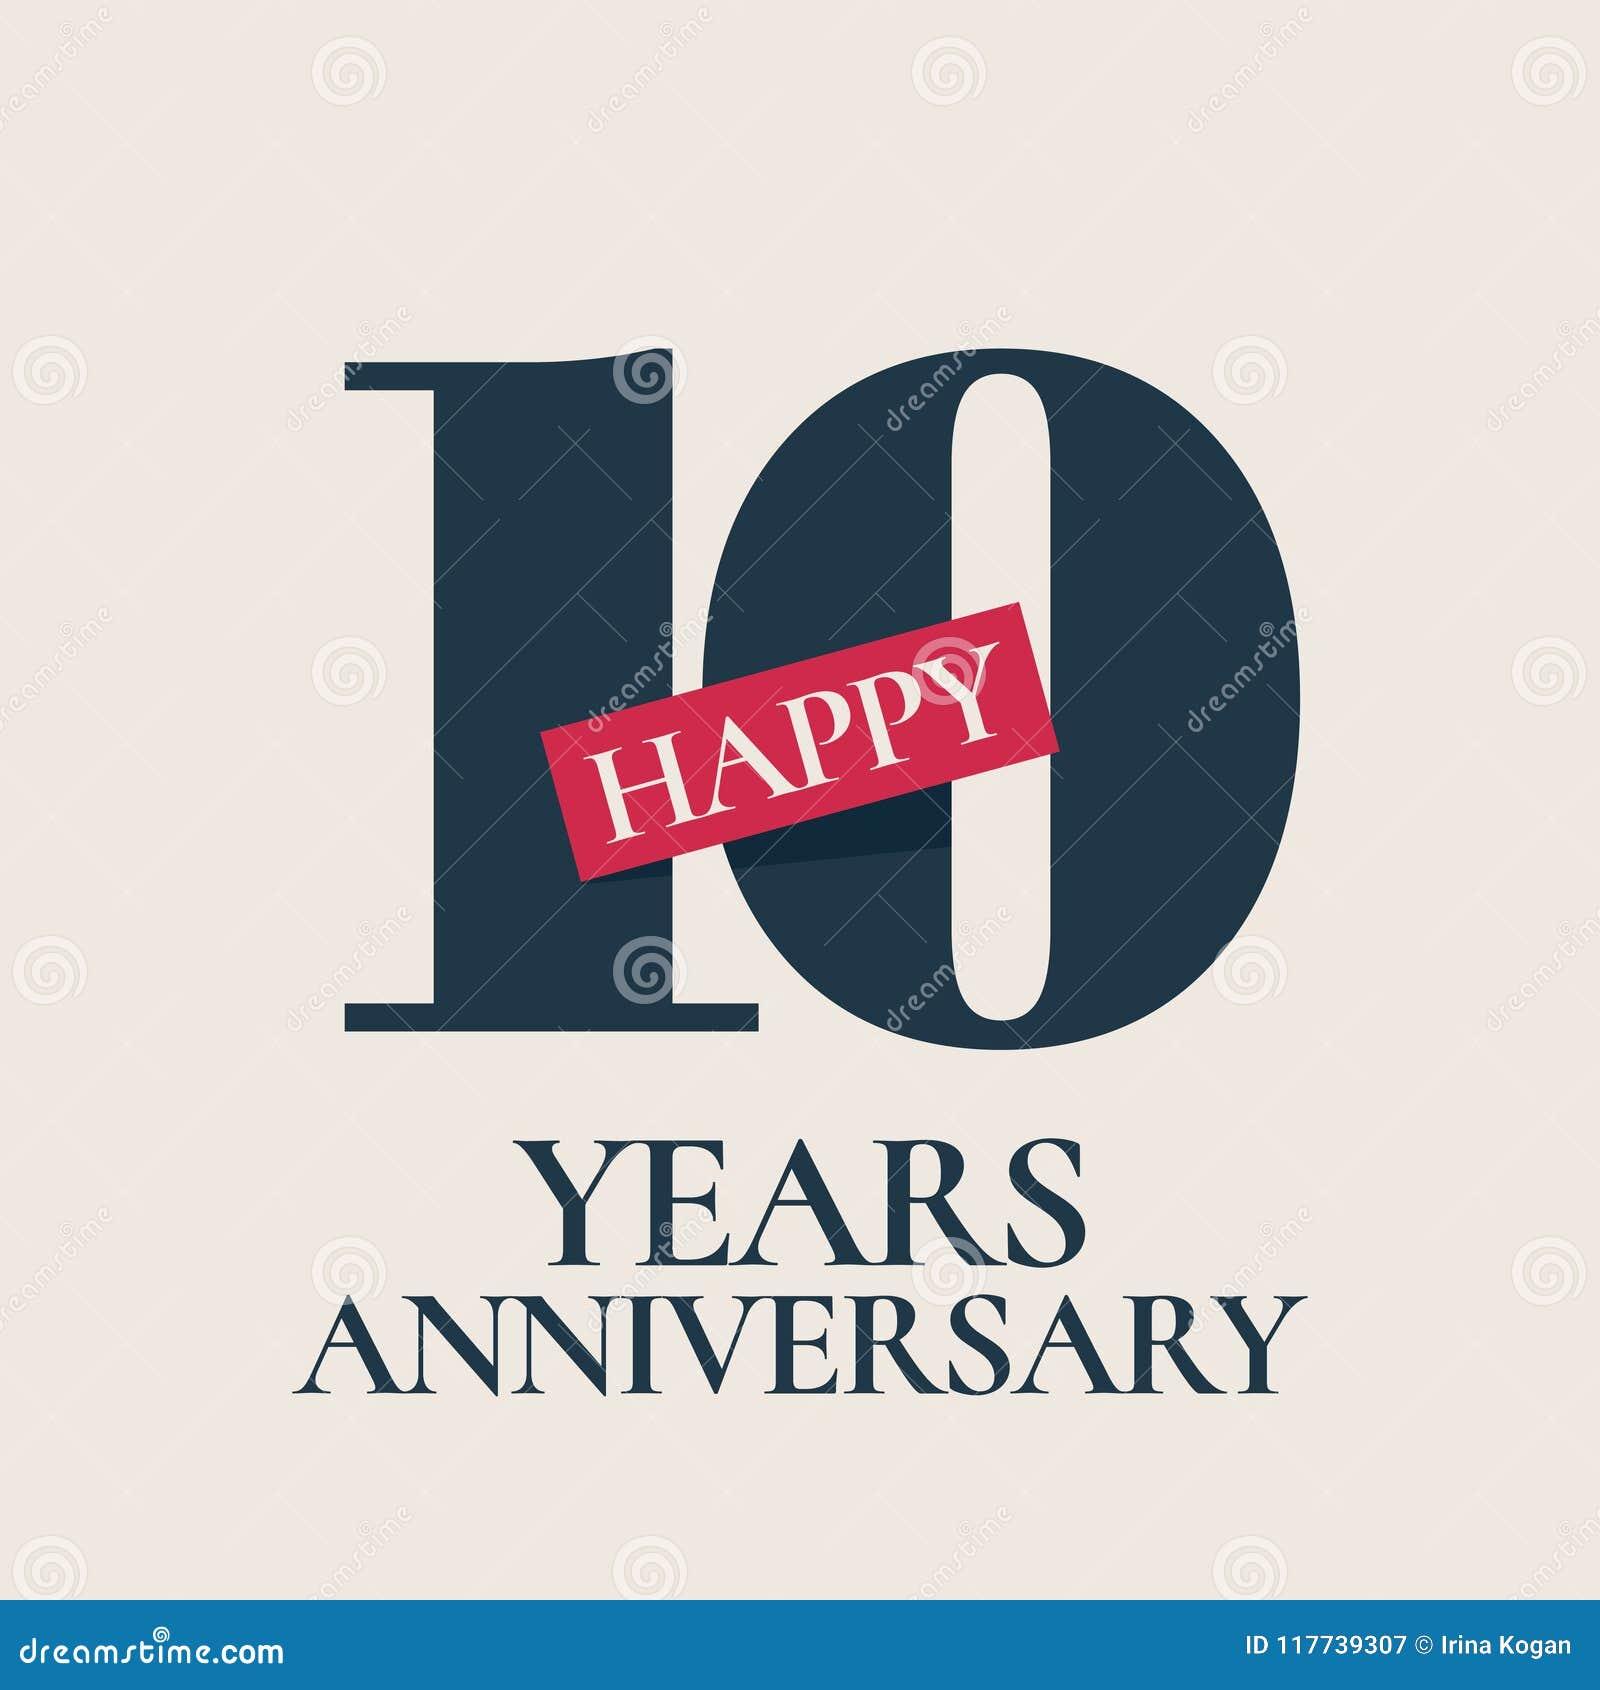 10 Years Anniversary Vector Logo Icon Stock Vector Illustration